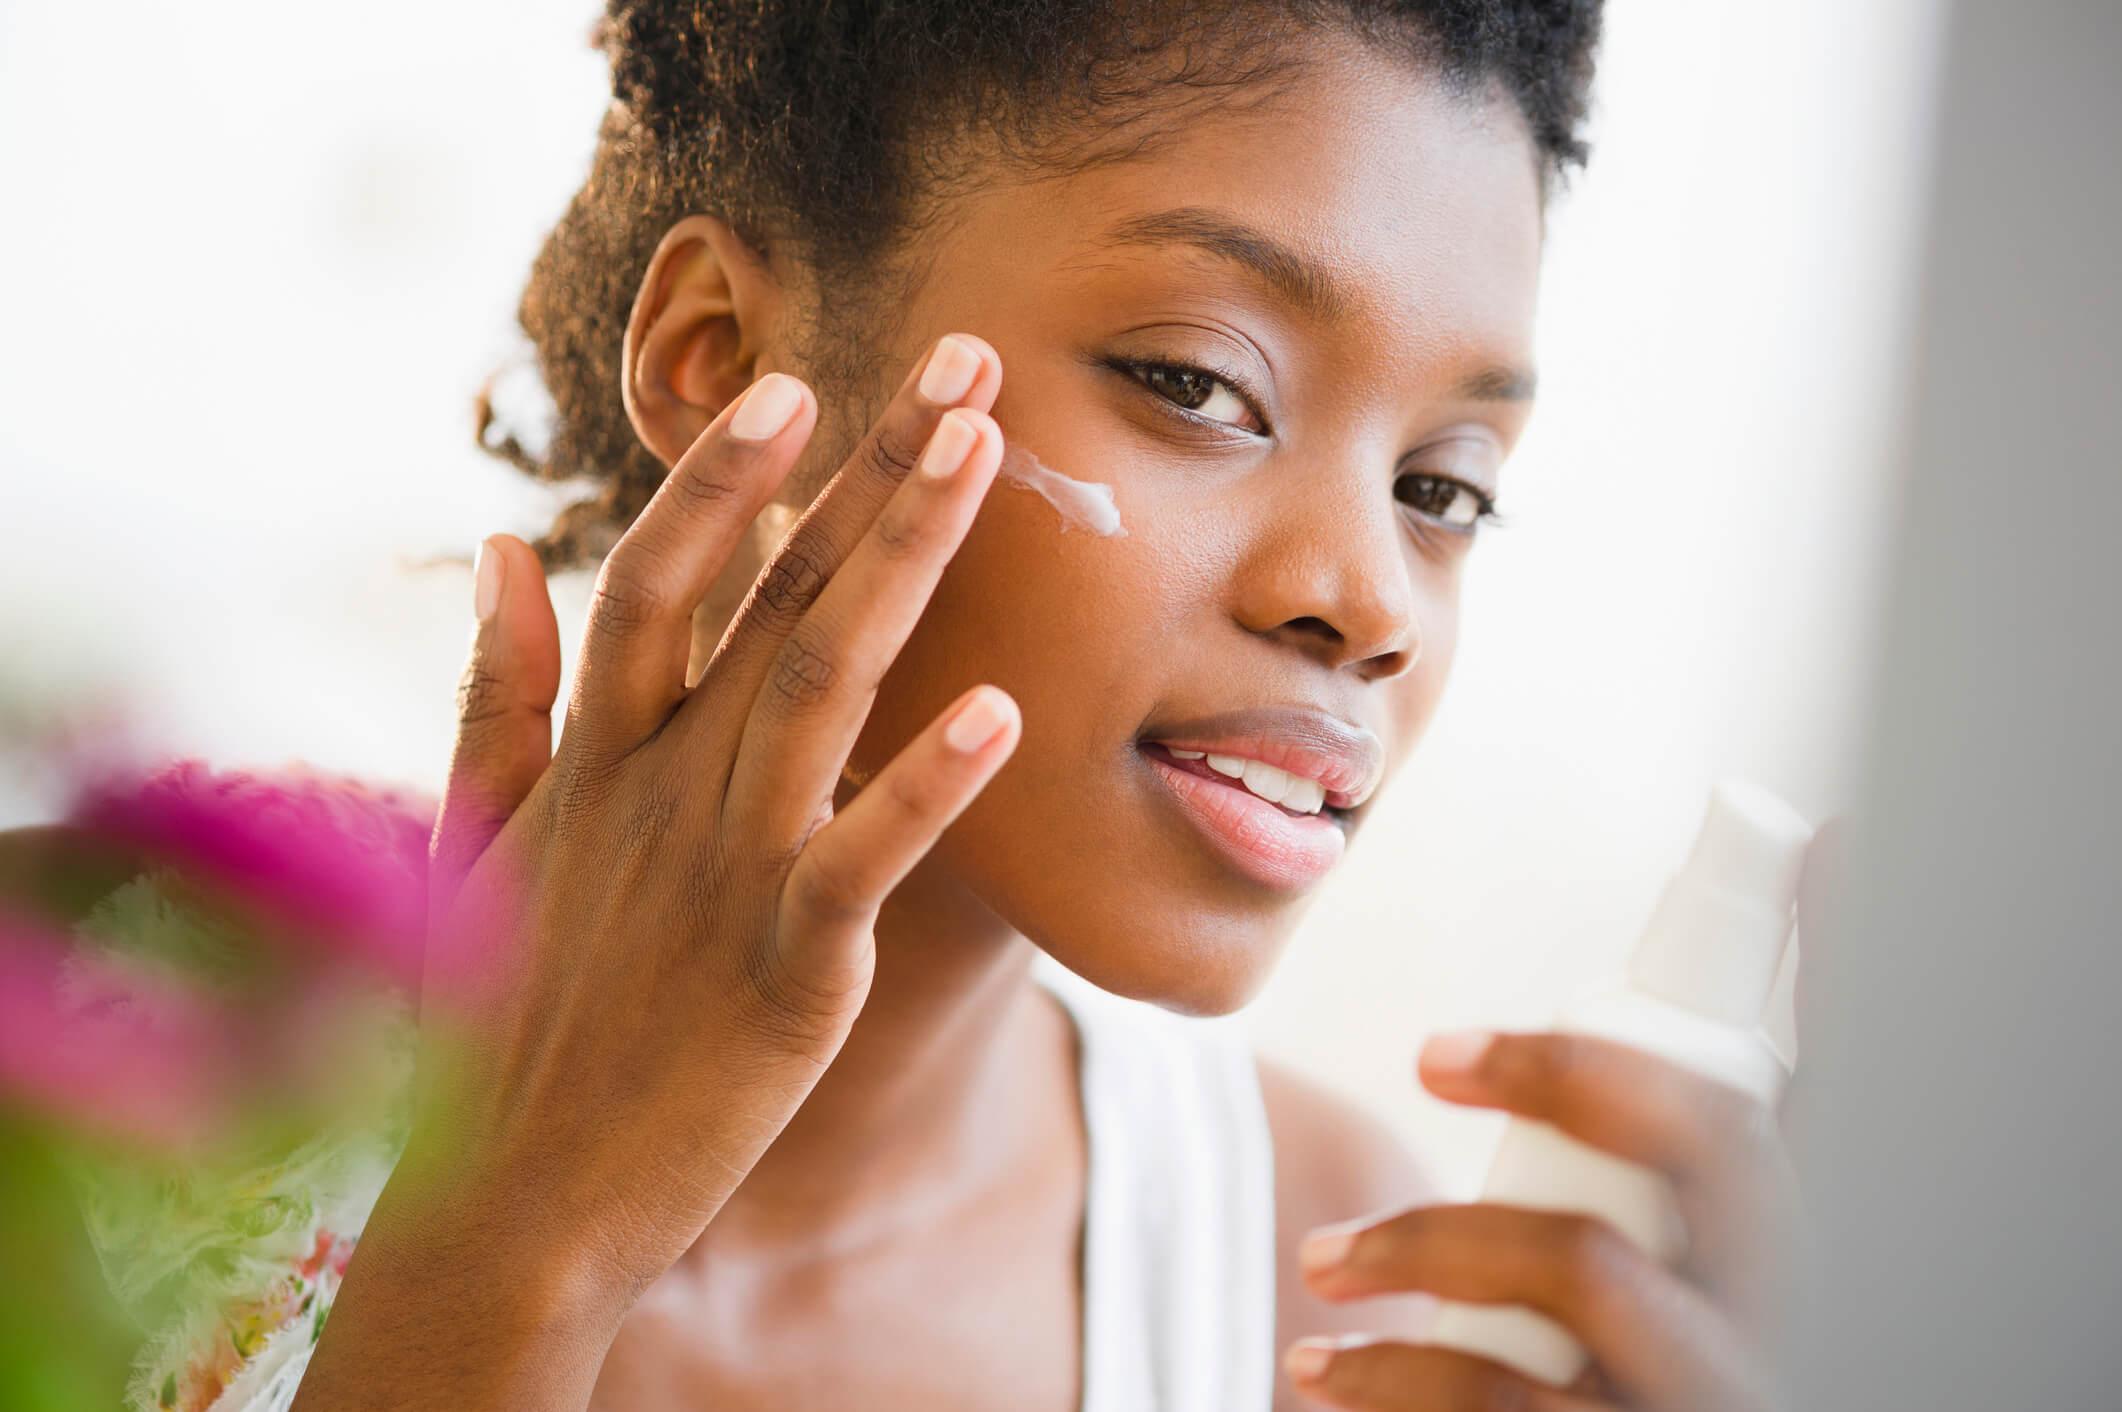 10 Best Primer for Oily Skin in Australia